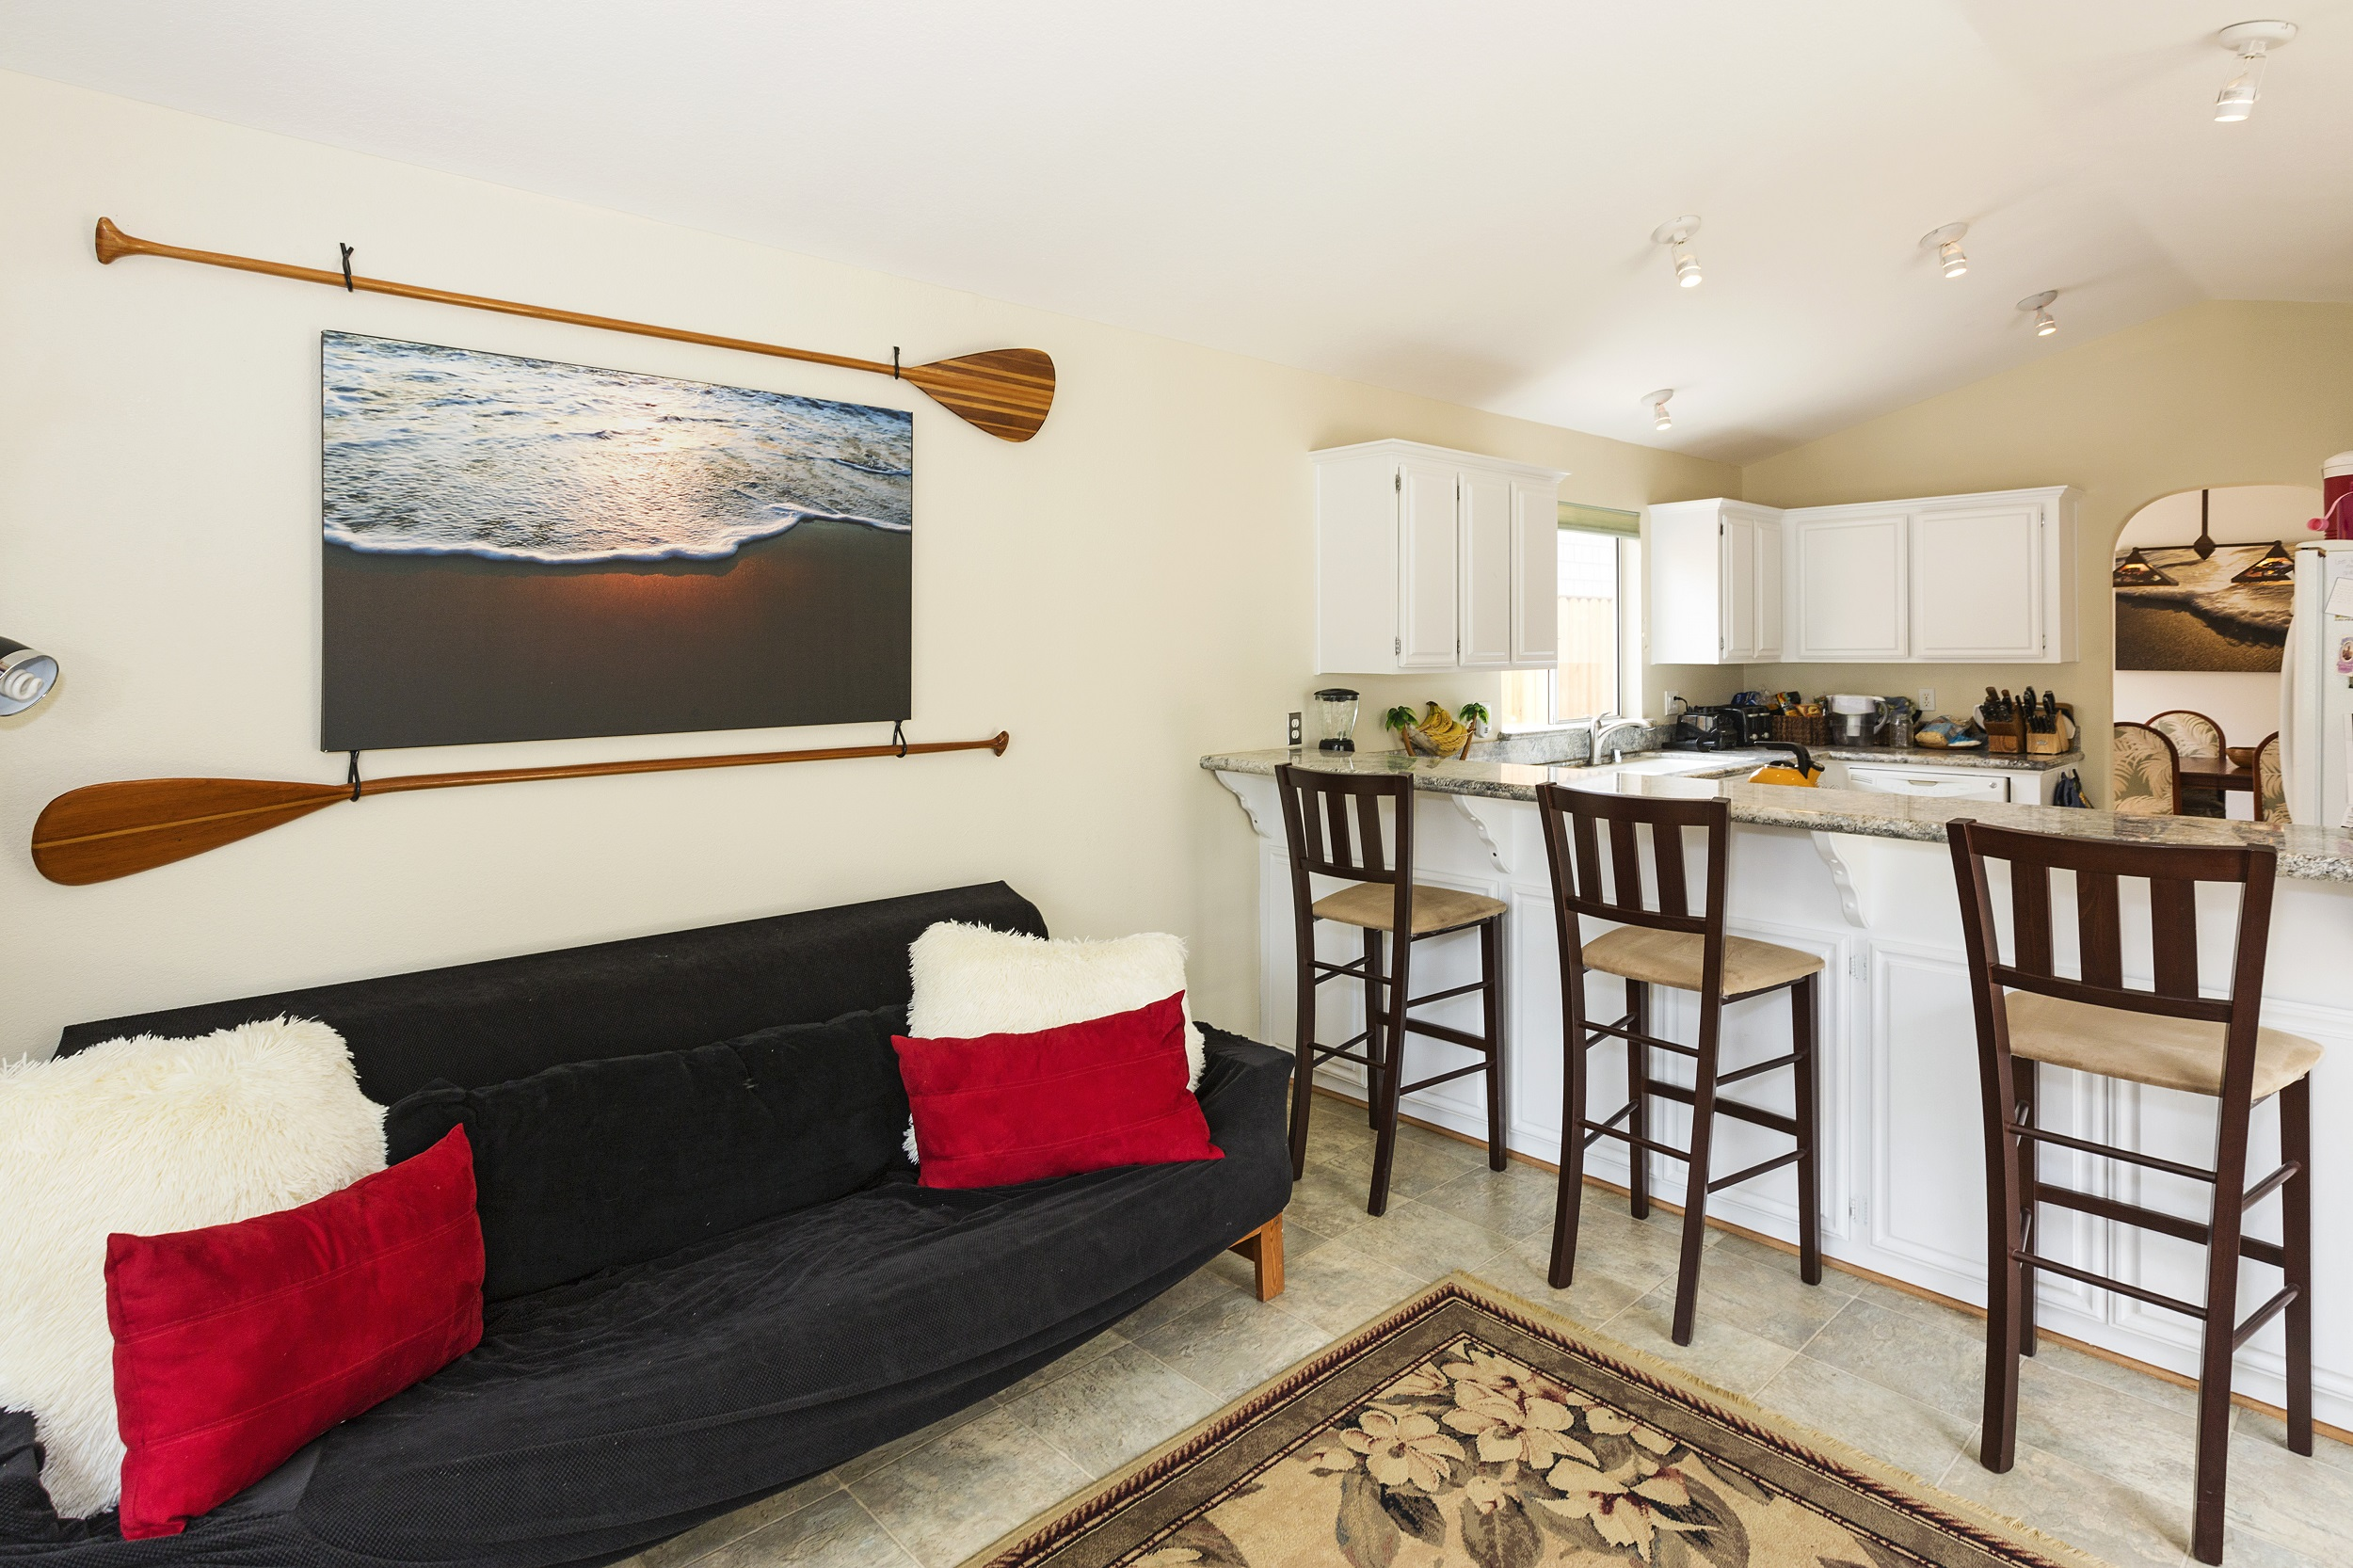 Malibu Mobile Home Lists For 375 Million